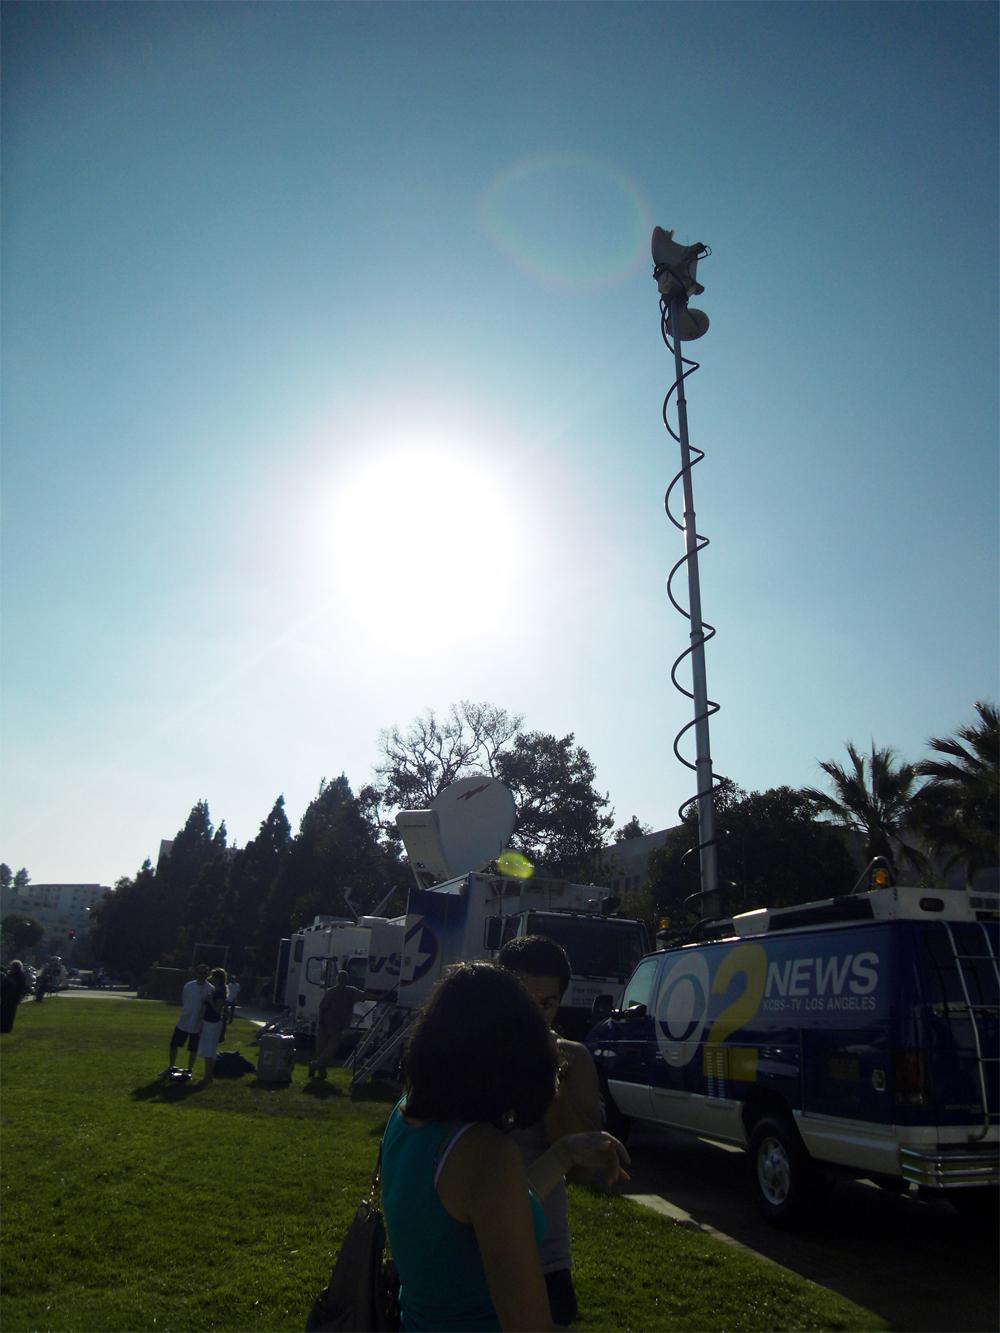 Media vans converge at UCLA